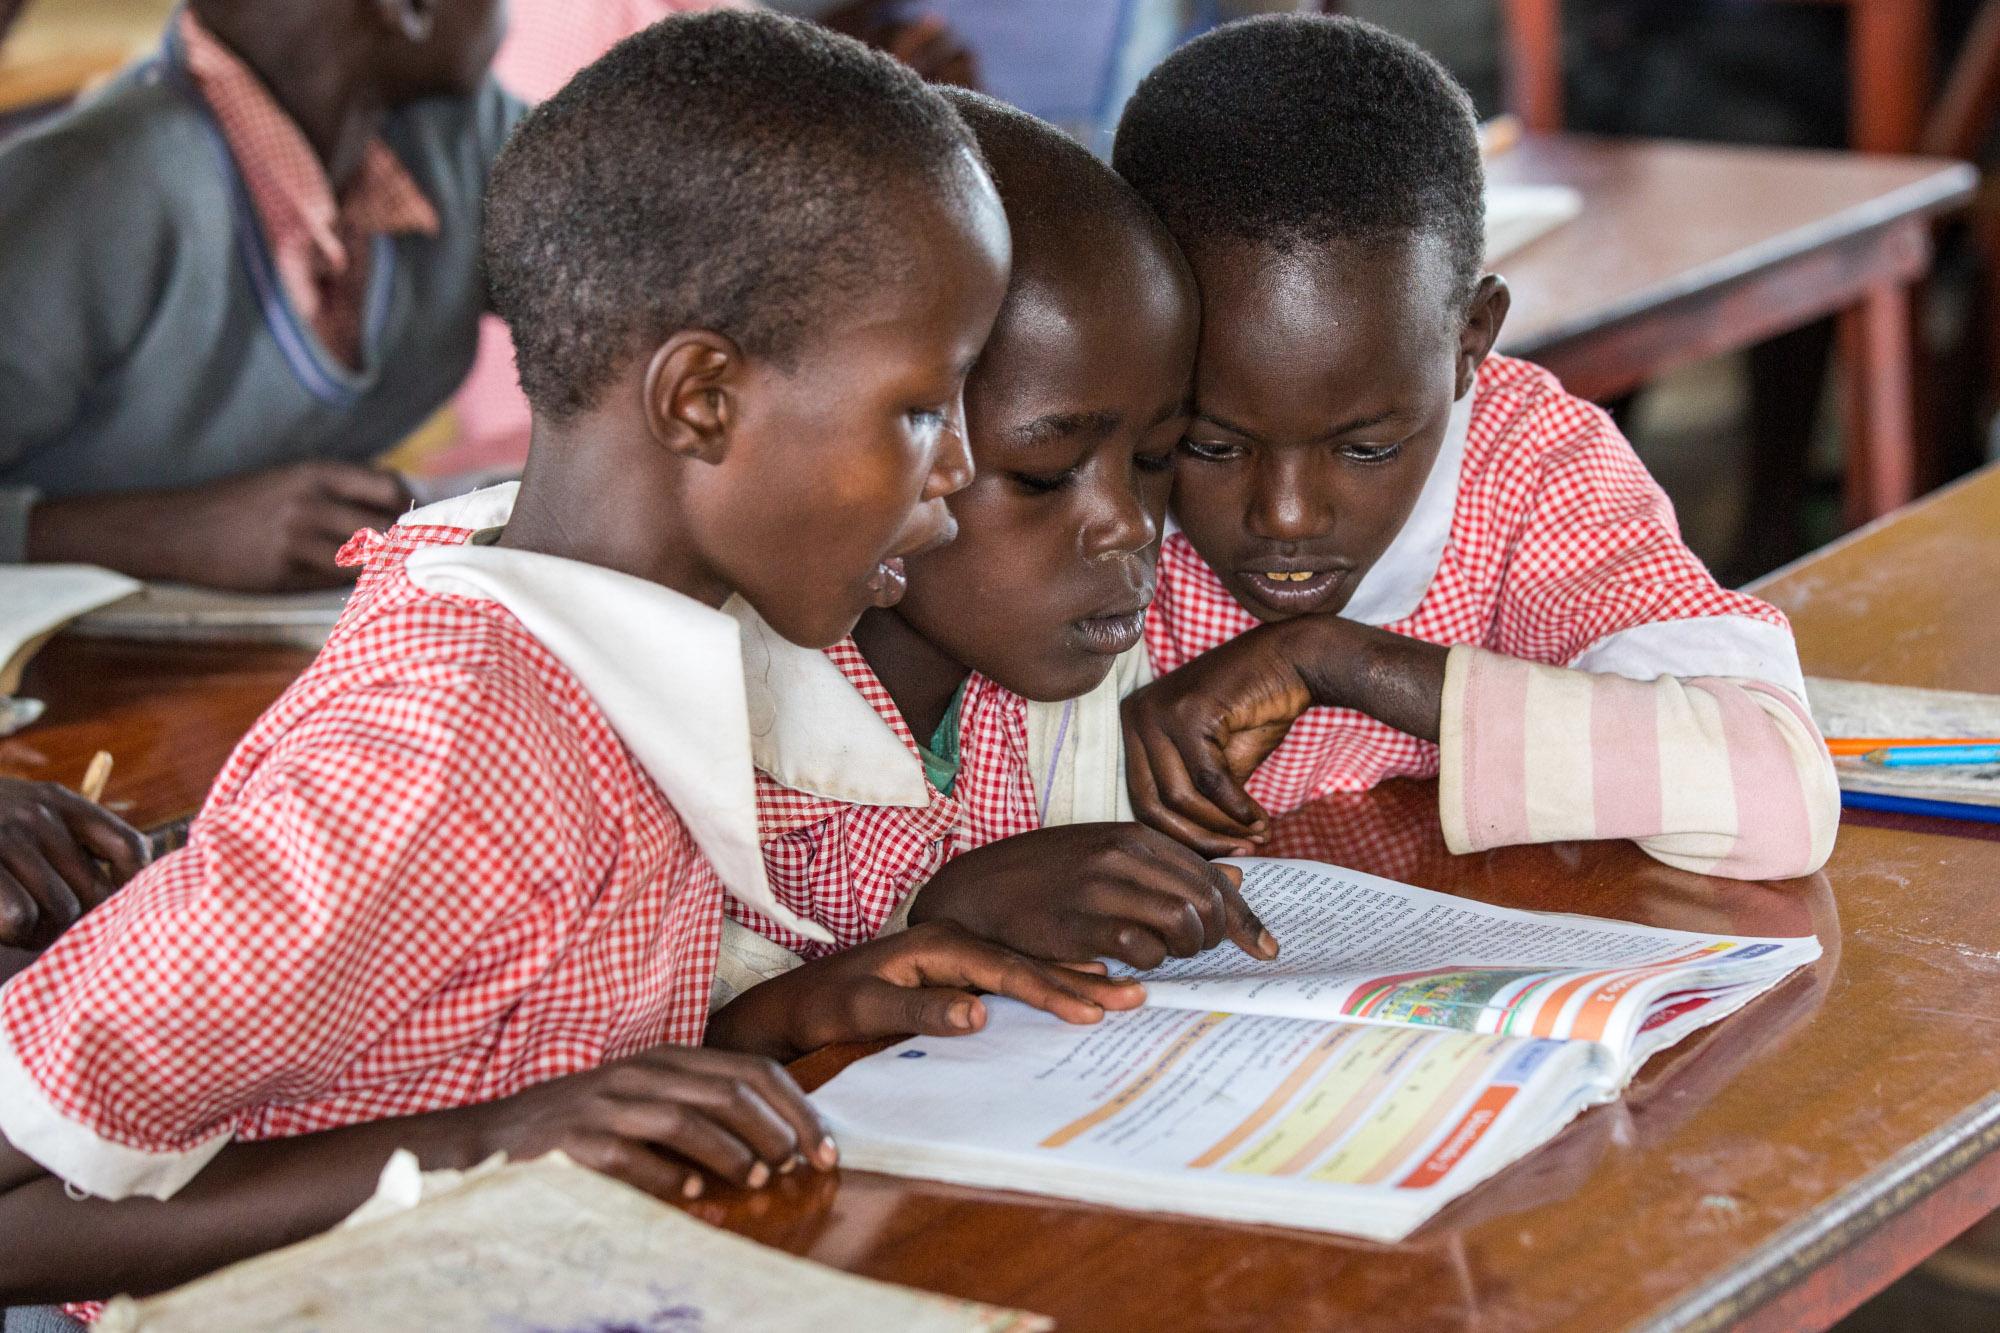 Economic hit won't stop Kenya Hope schools